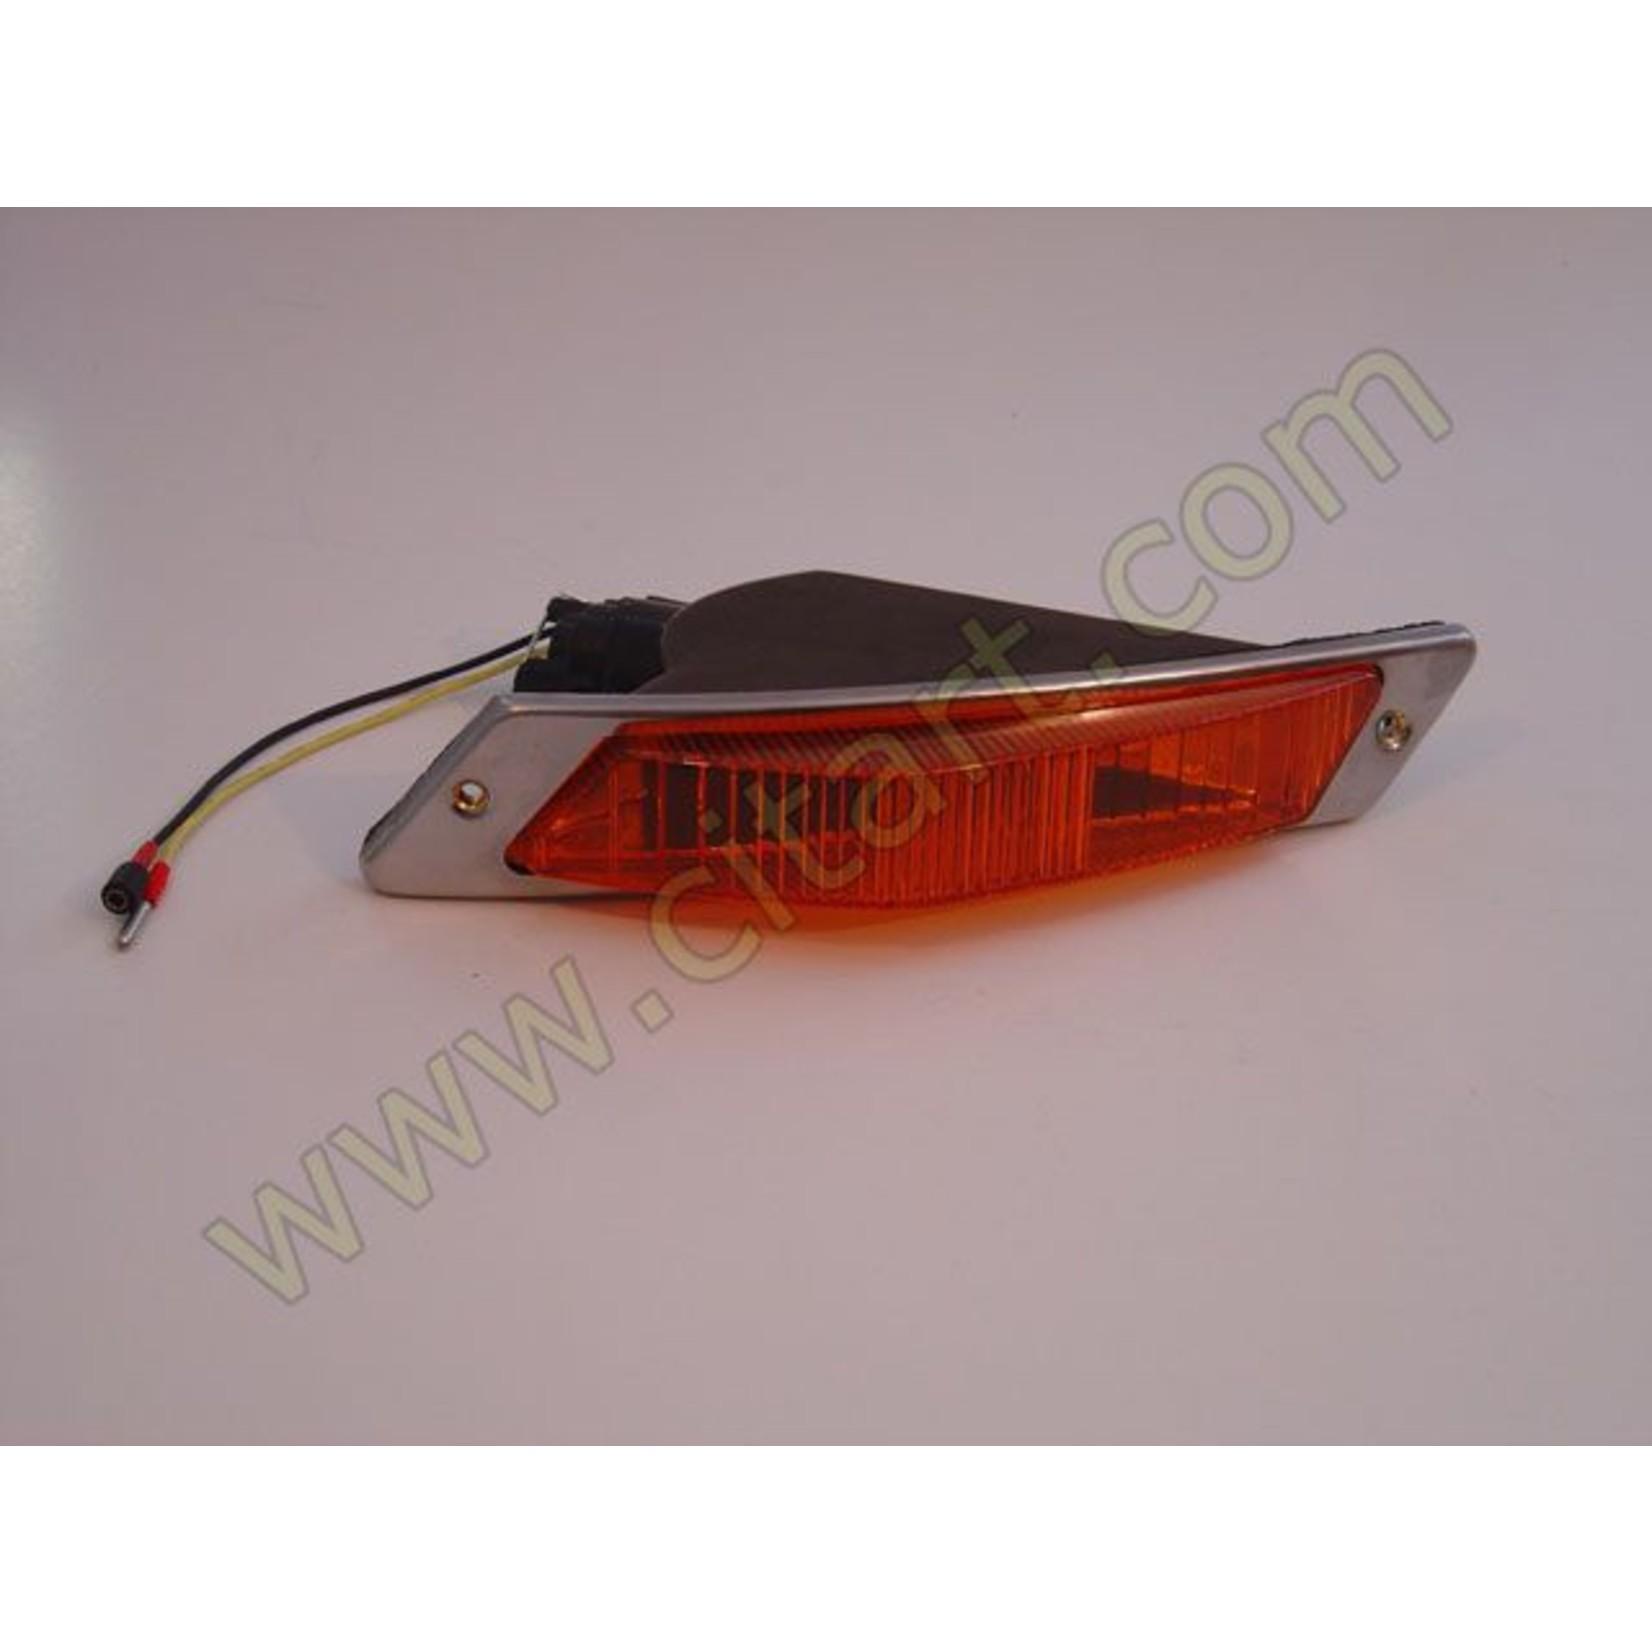 Richtingaanwijzer oranje rechts pallas 68- Nr Org: DX575010W